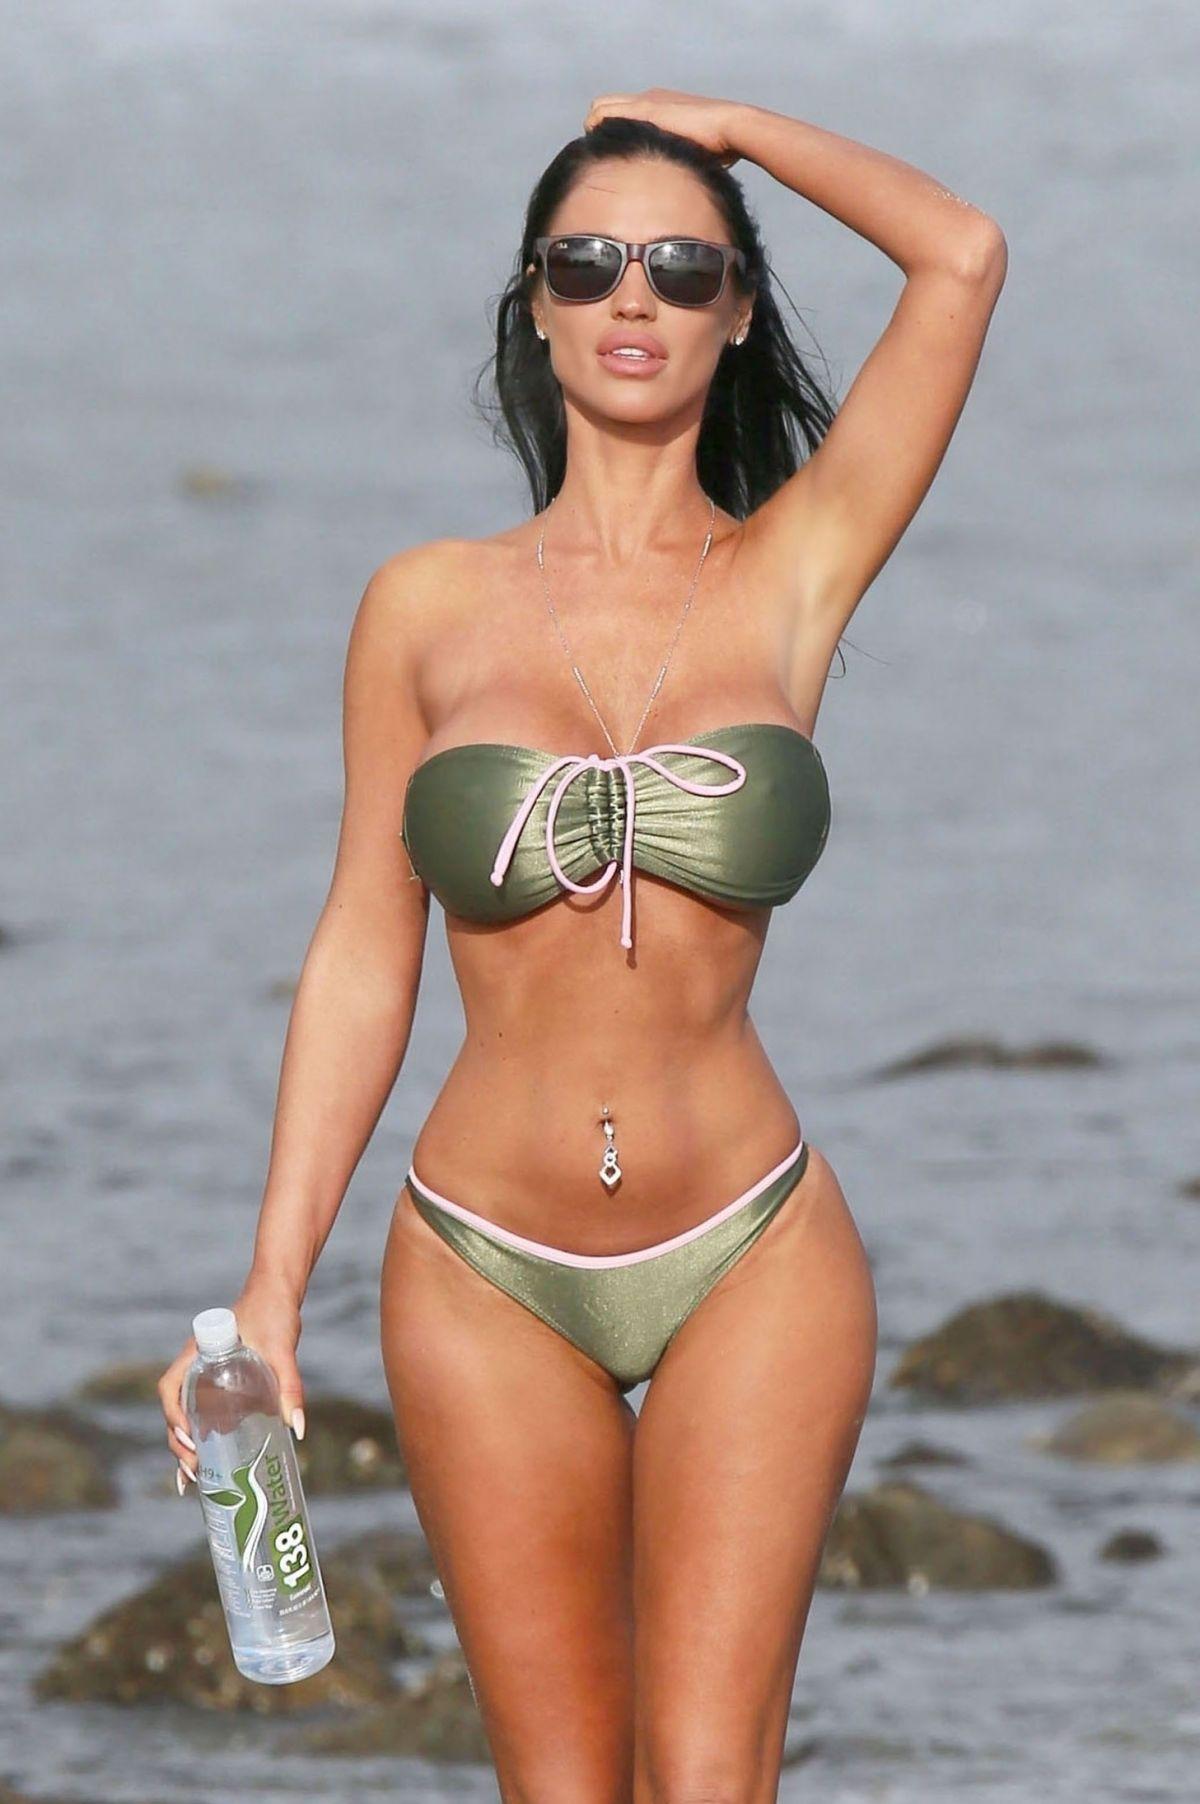 Hot Charlie Riina  nudes (41 photos), Snapchat, cameltoe